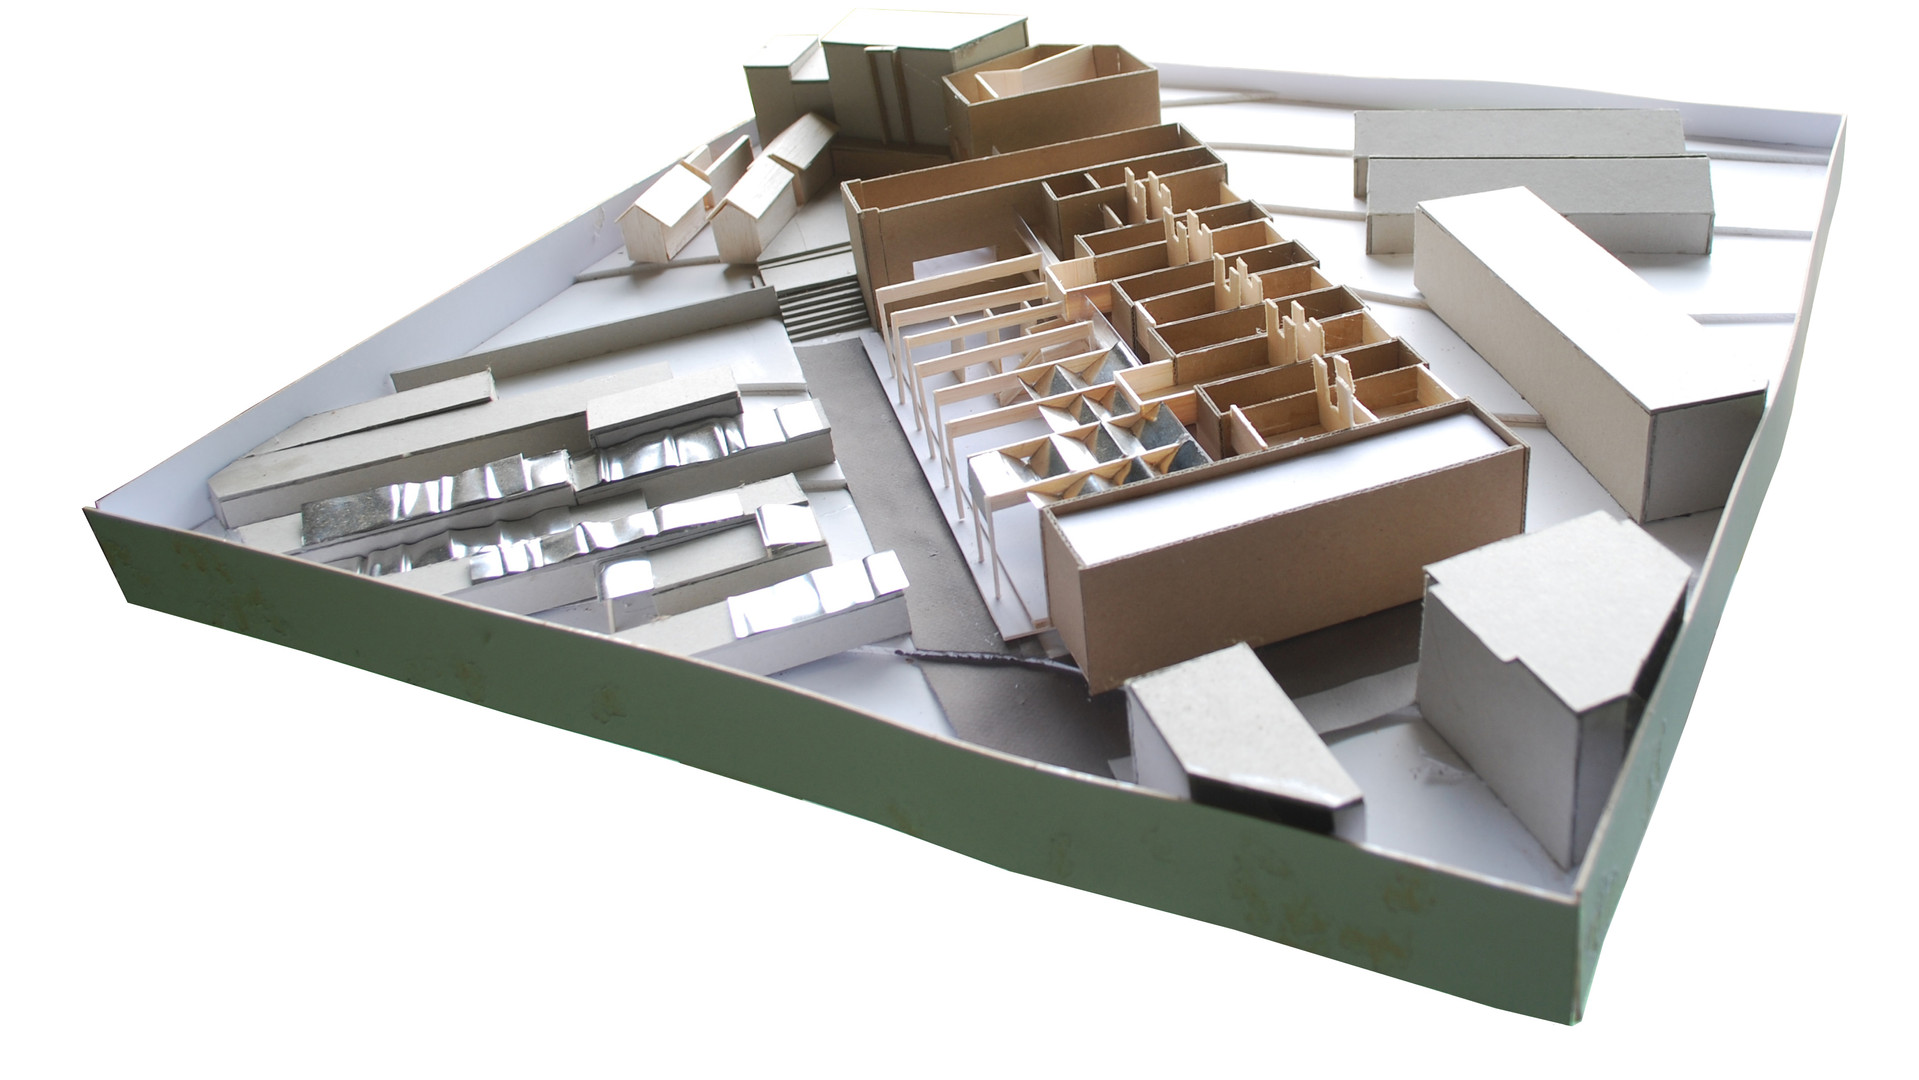 Architecture model for self-build training centre